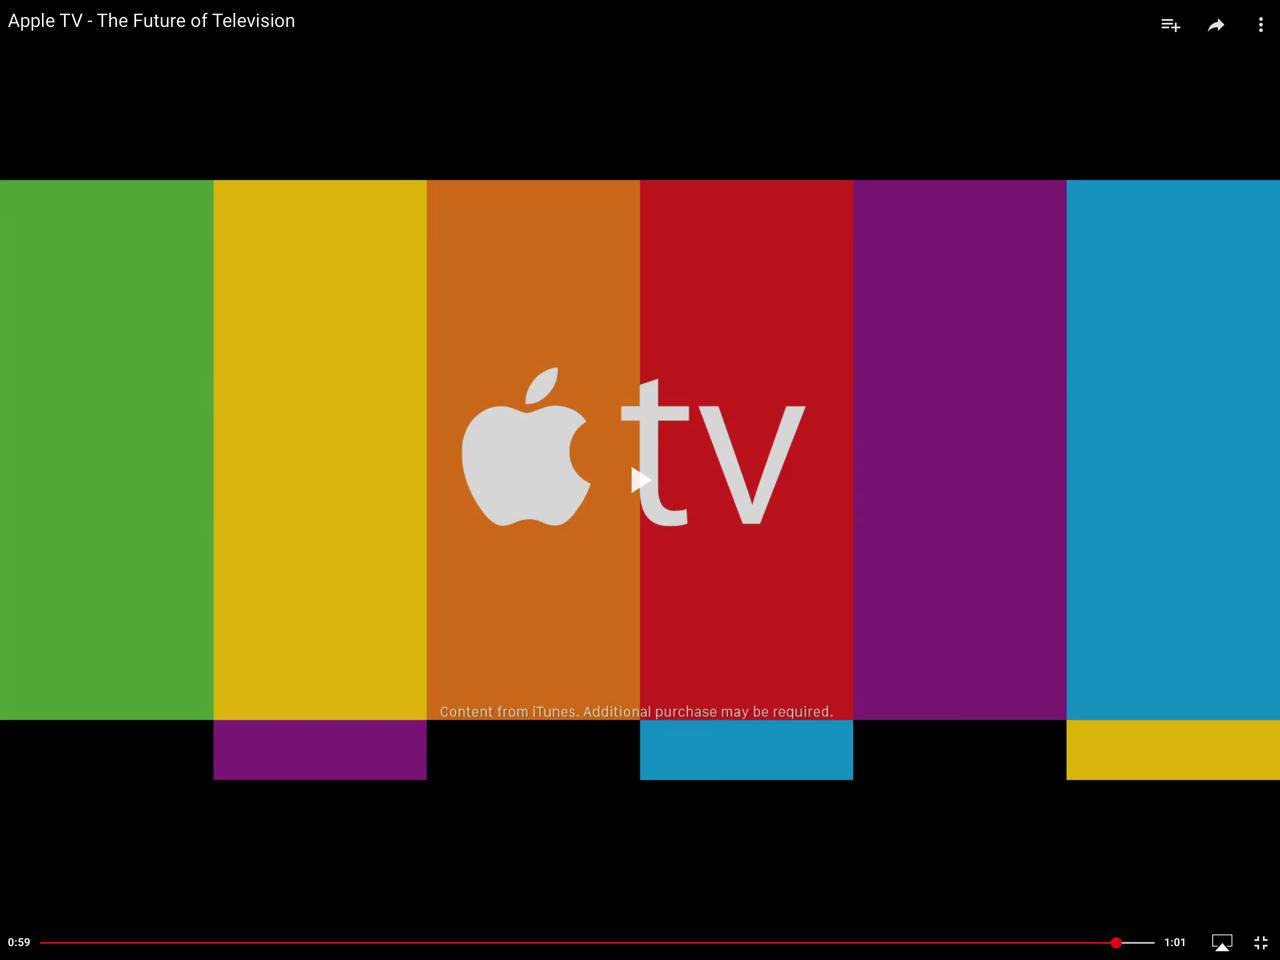 Ios app youtube corresponding to resolution of ipad pro1